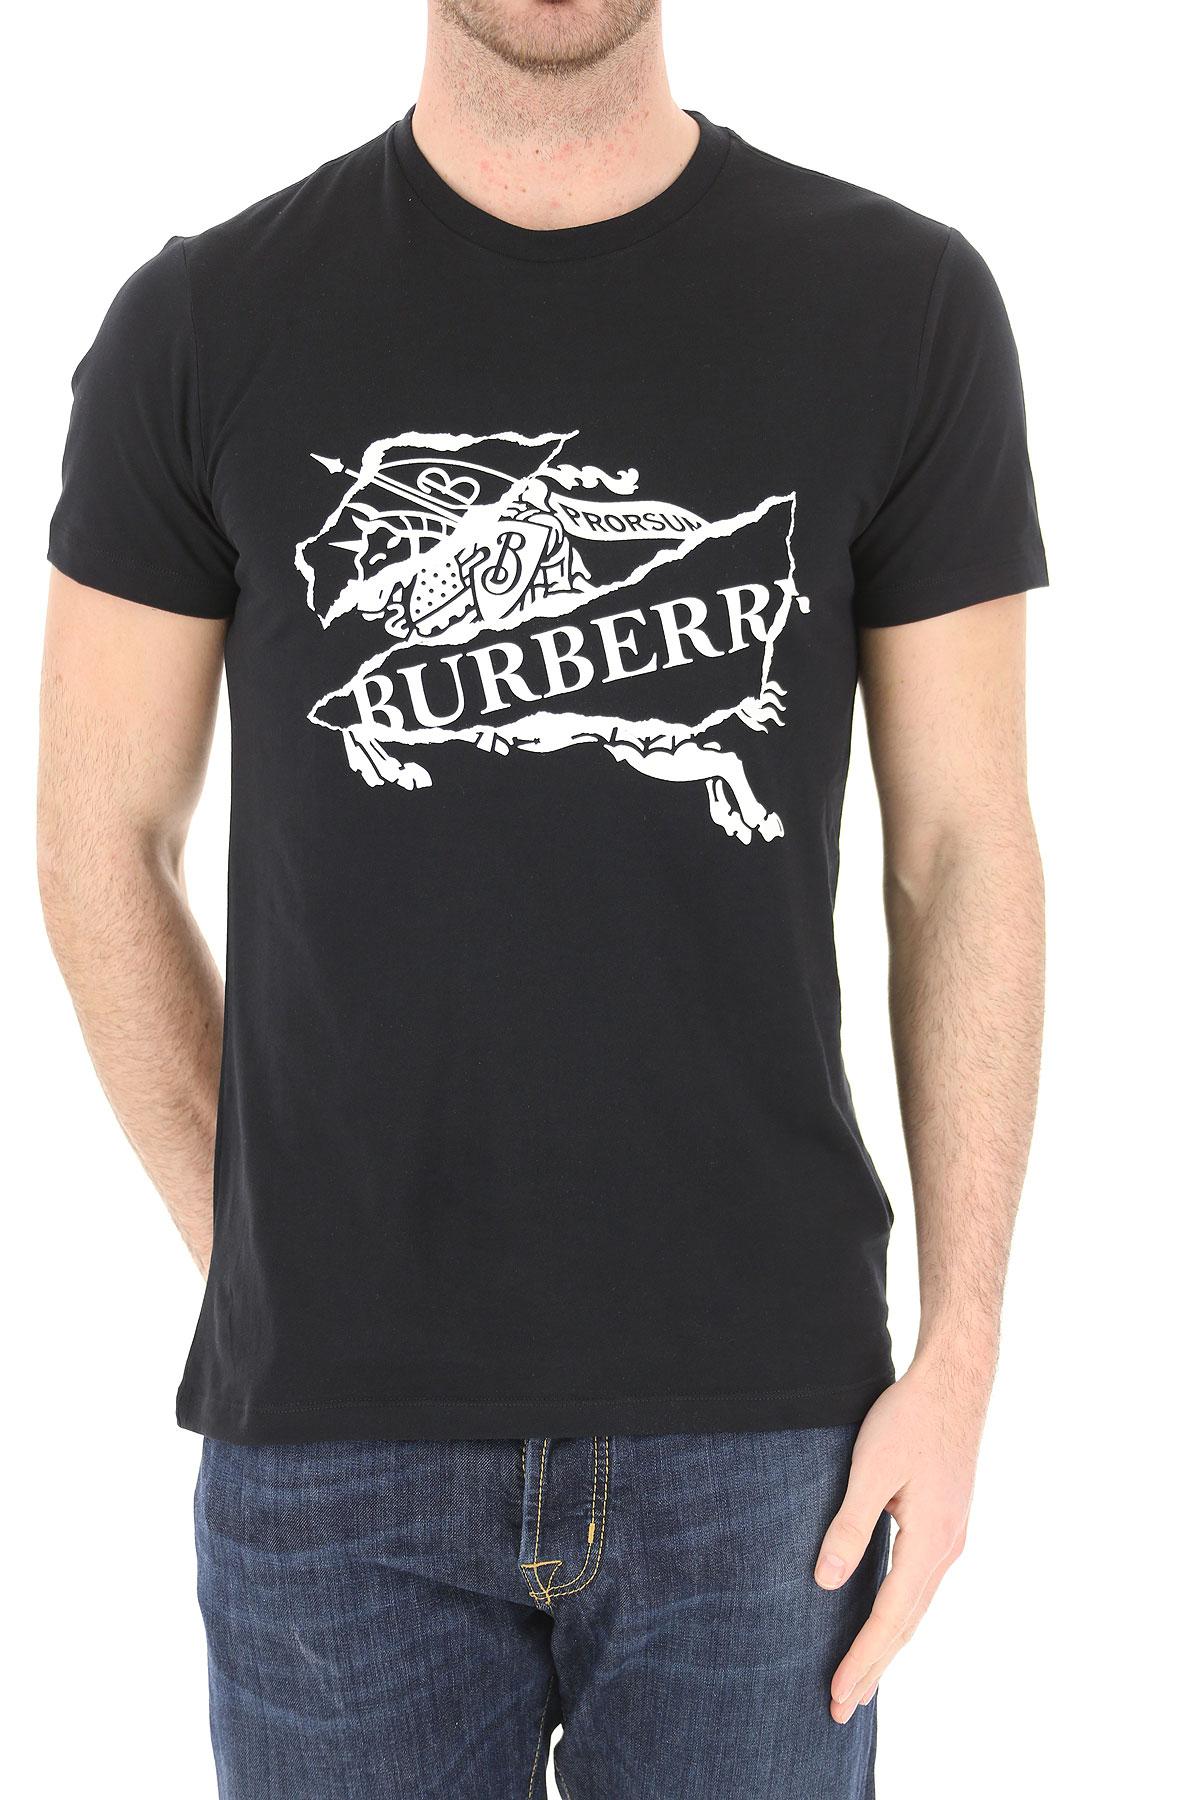 Para Ropa verano Negro 2019 Burberry Primavera Blanco Hombres HBwq5